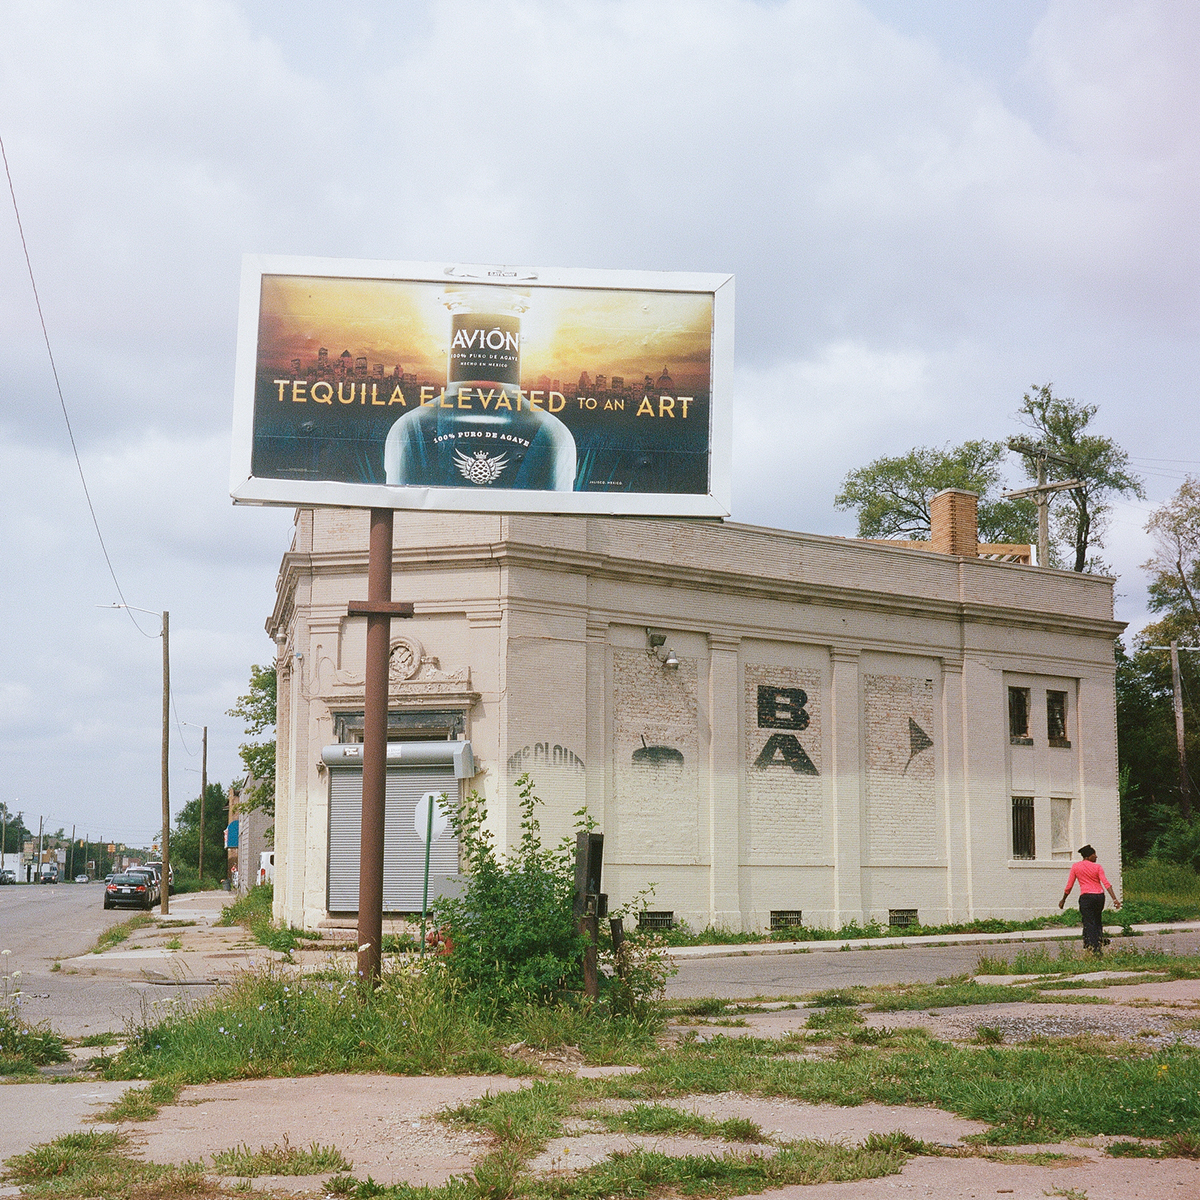 Gateway_Billboards-64.jpg